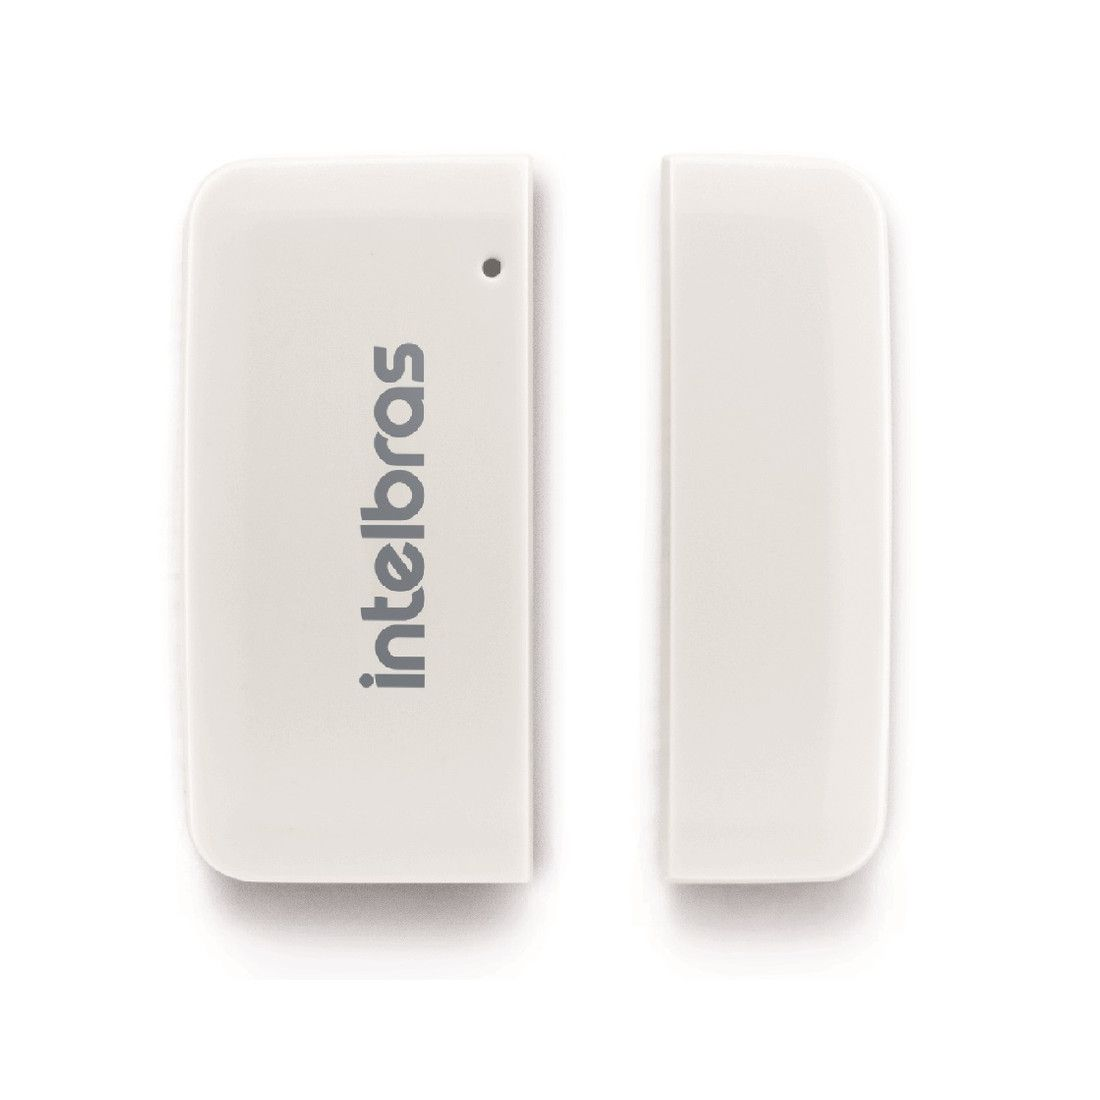 Sensor Magnético Intelbras XAS 8000 Sem Fio de Abertura